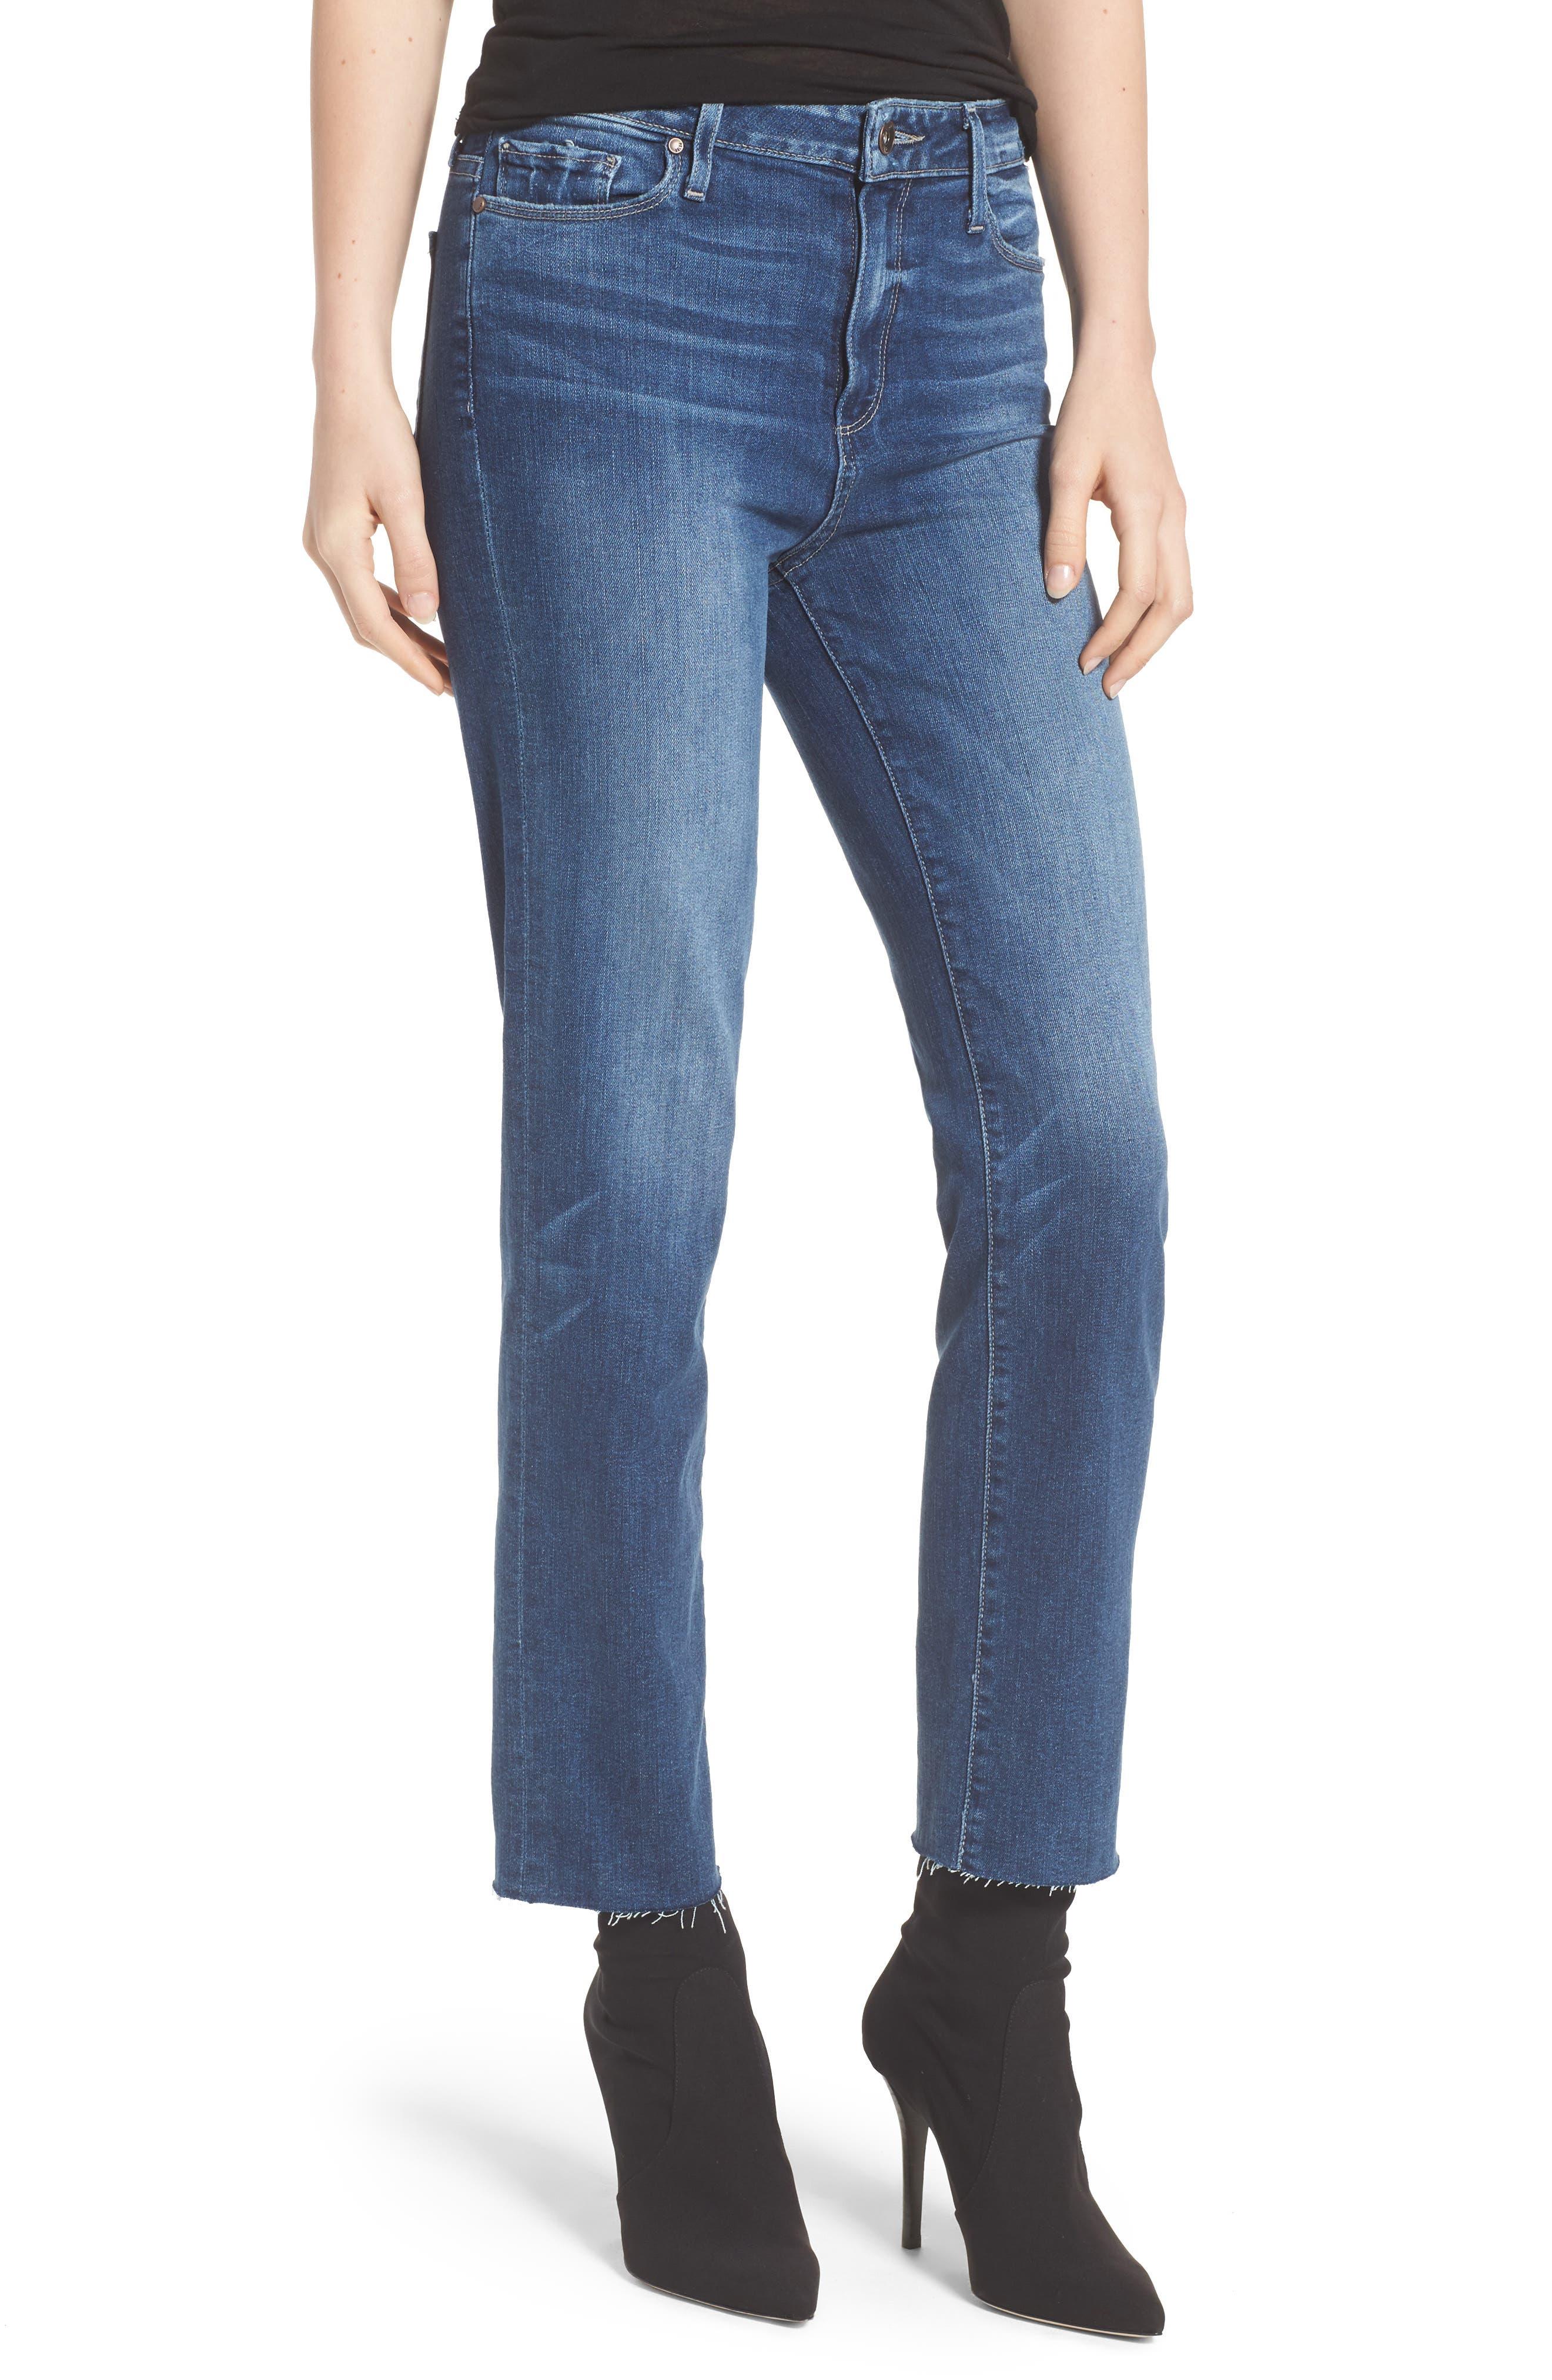 Transcend - Hoxton Ankle Straight Leg Jeans,                         Main,                         color, 400